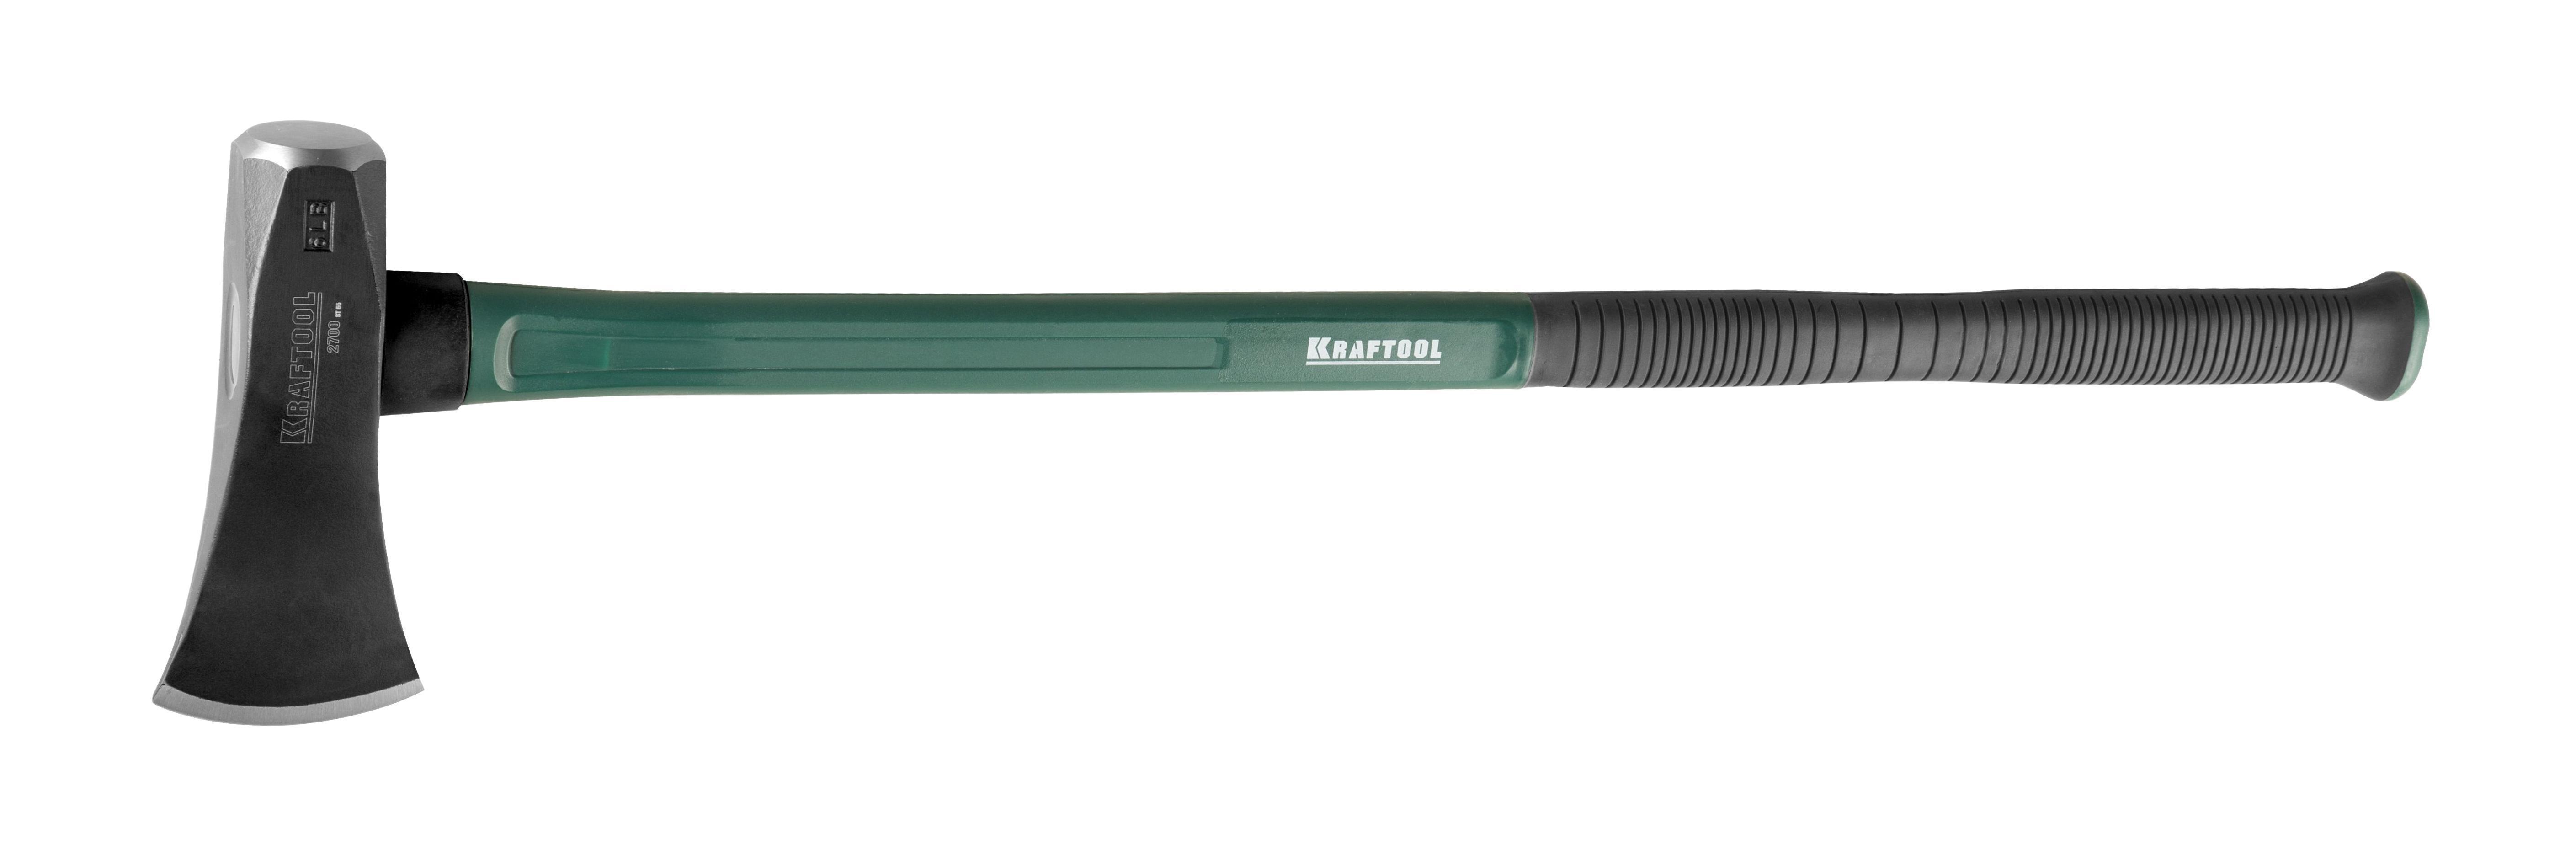 Топор Kraftool 20657-27